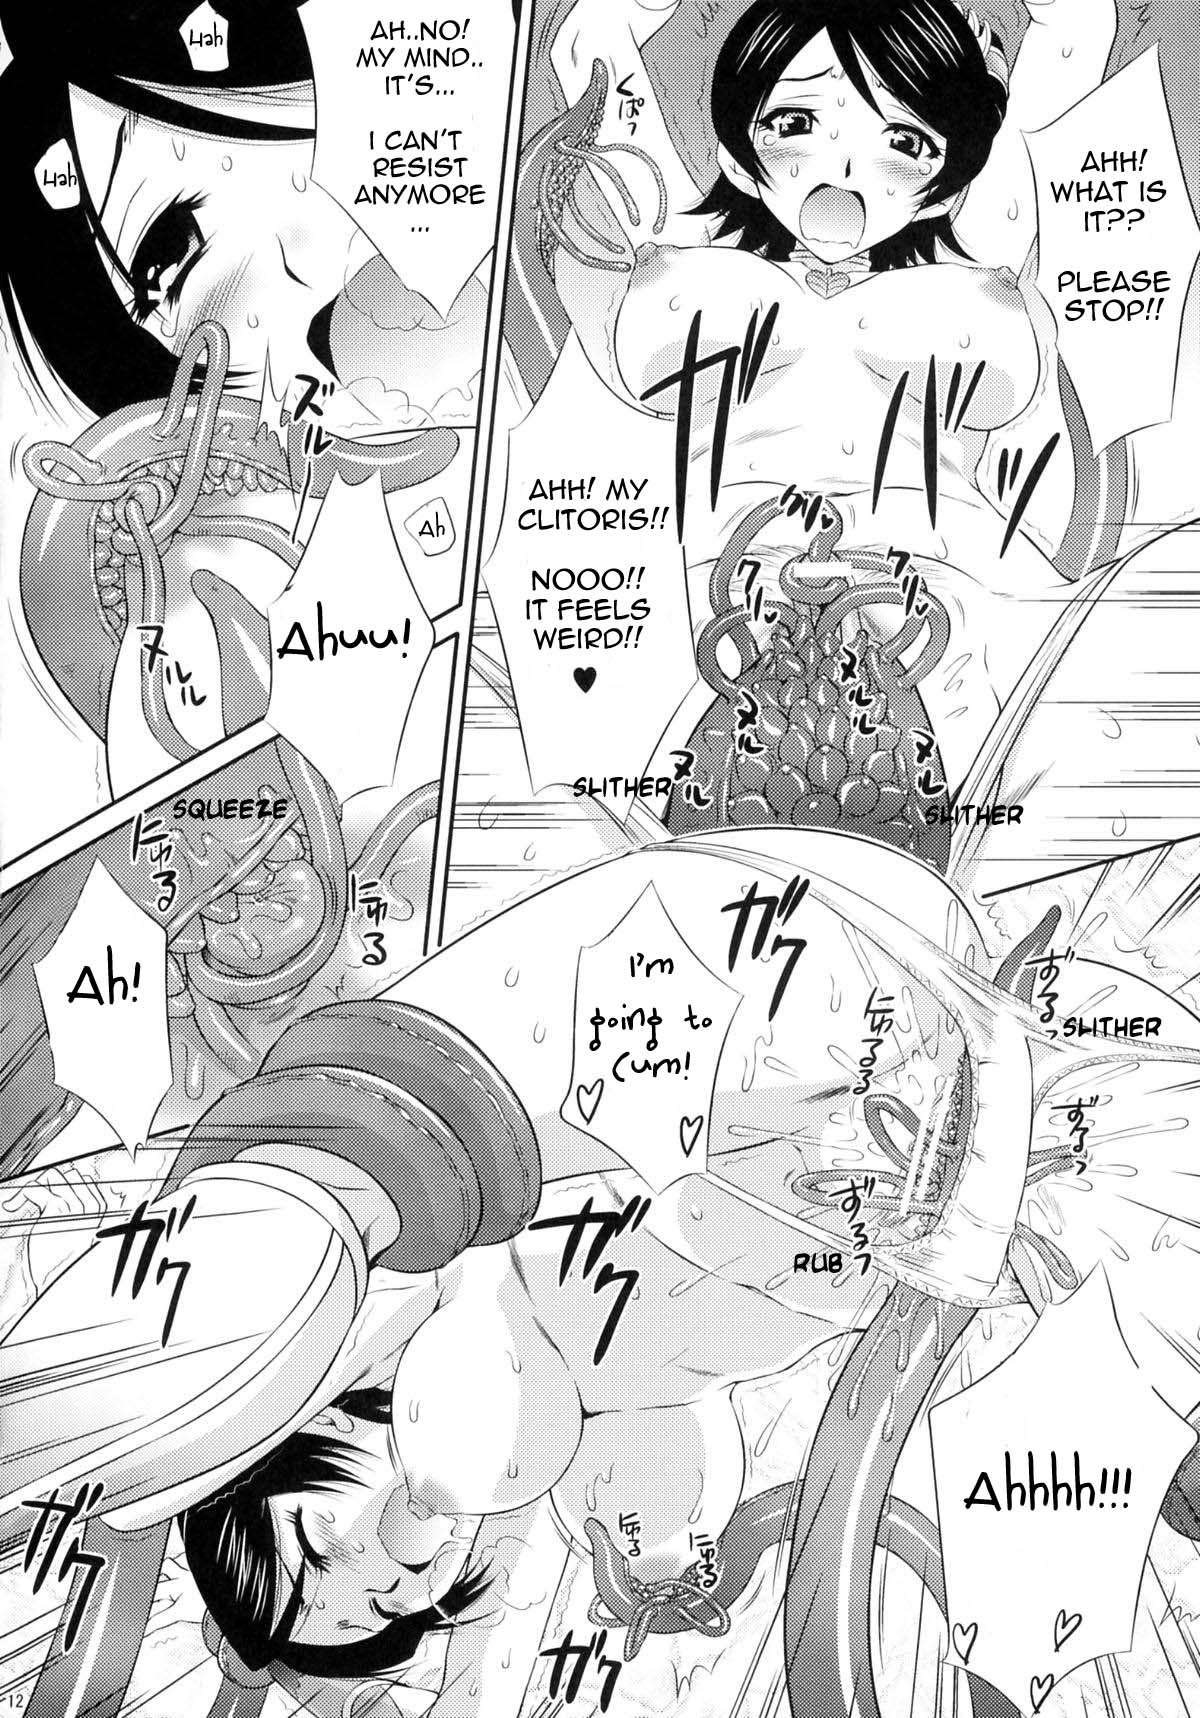 Dynasty Warriors Hentai - Free Hentai Manga, Doujinshi & XXX